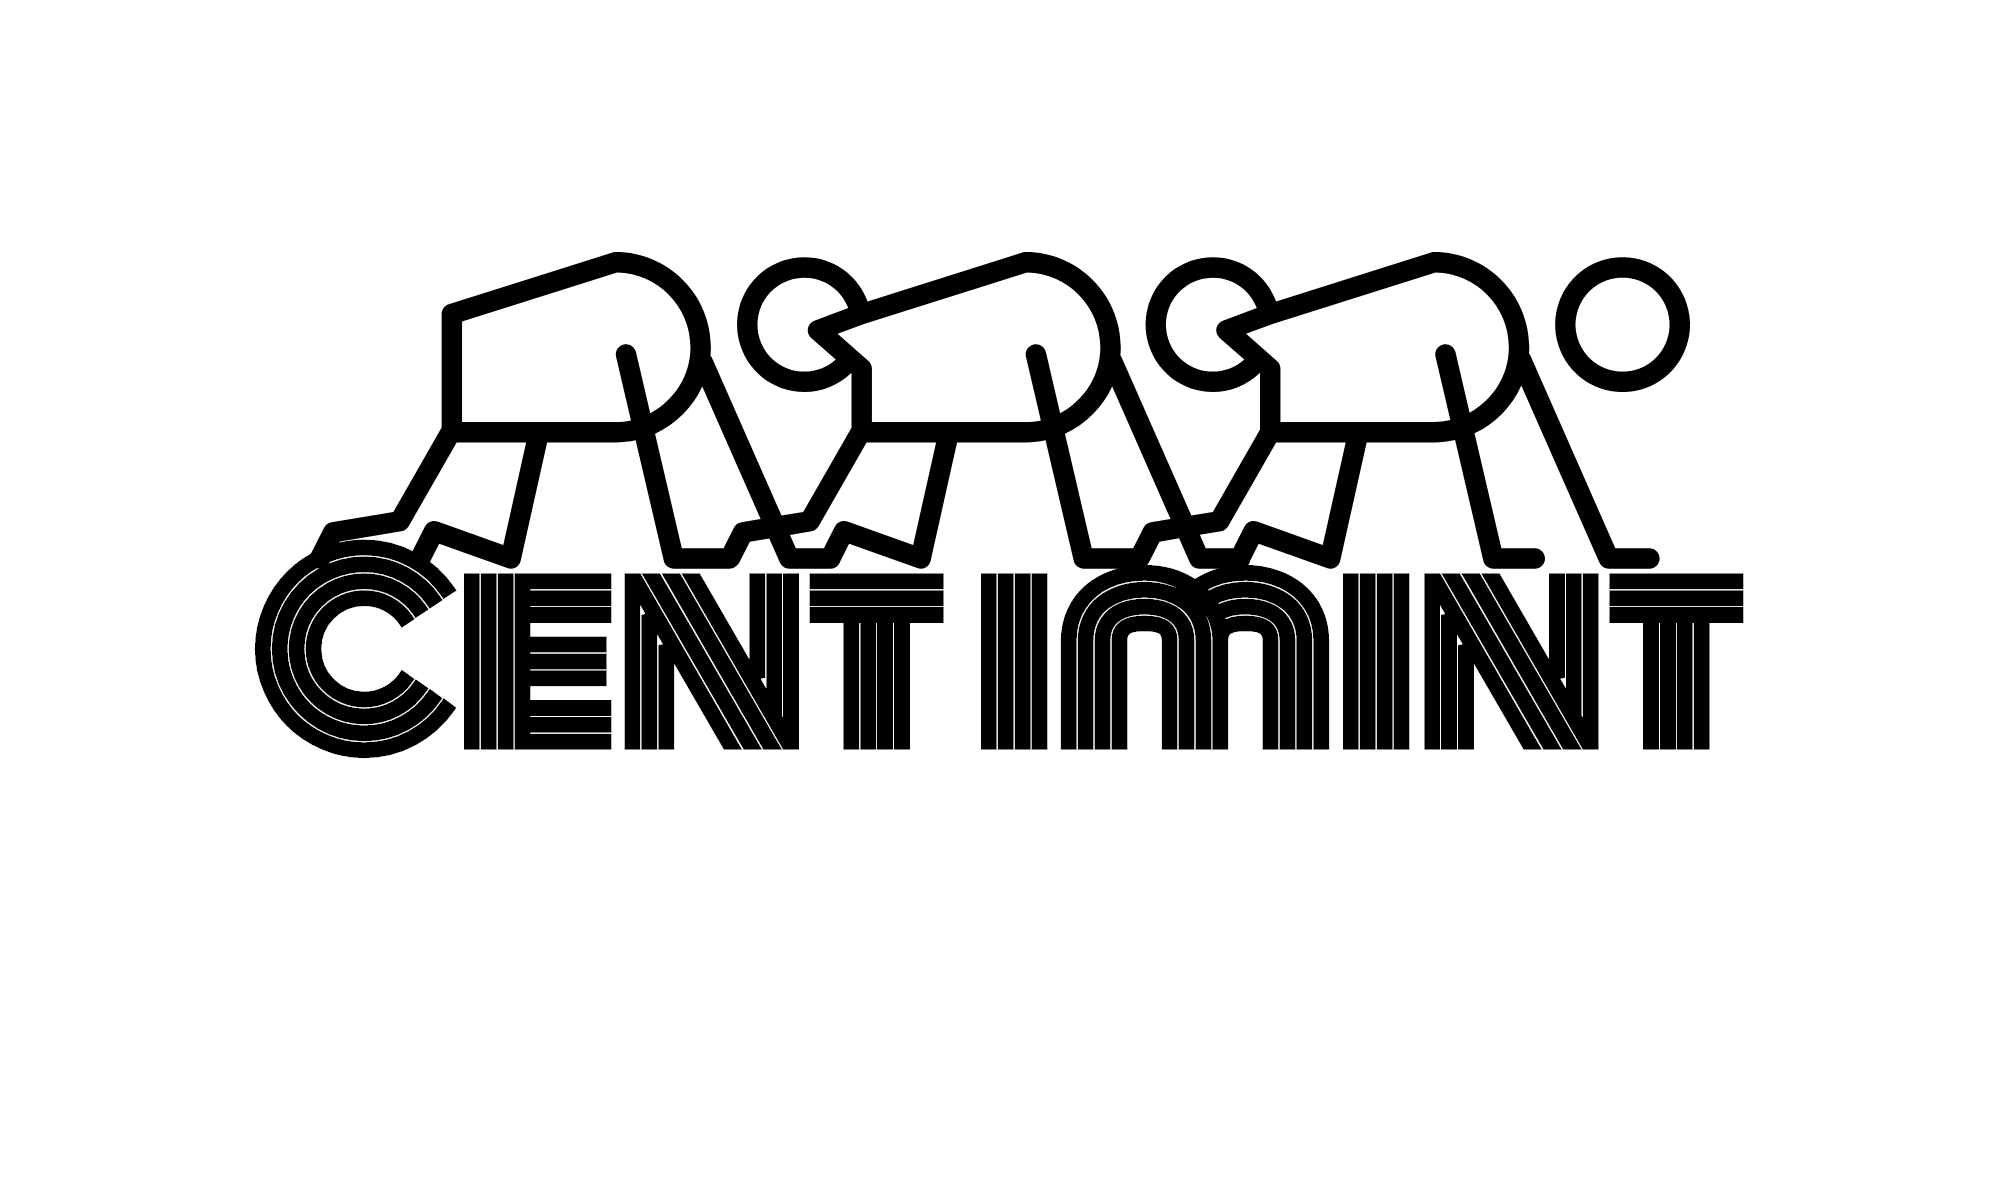 Cent imint-logo-black.png